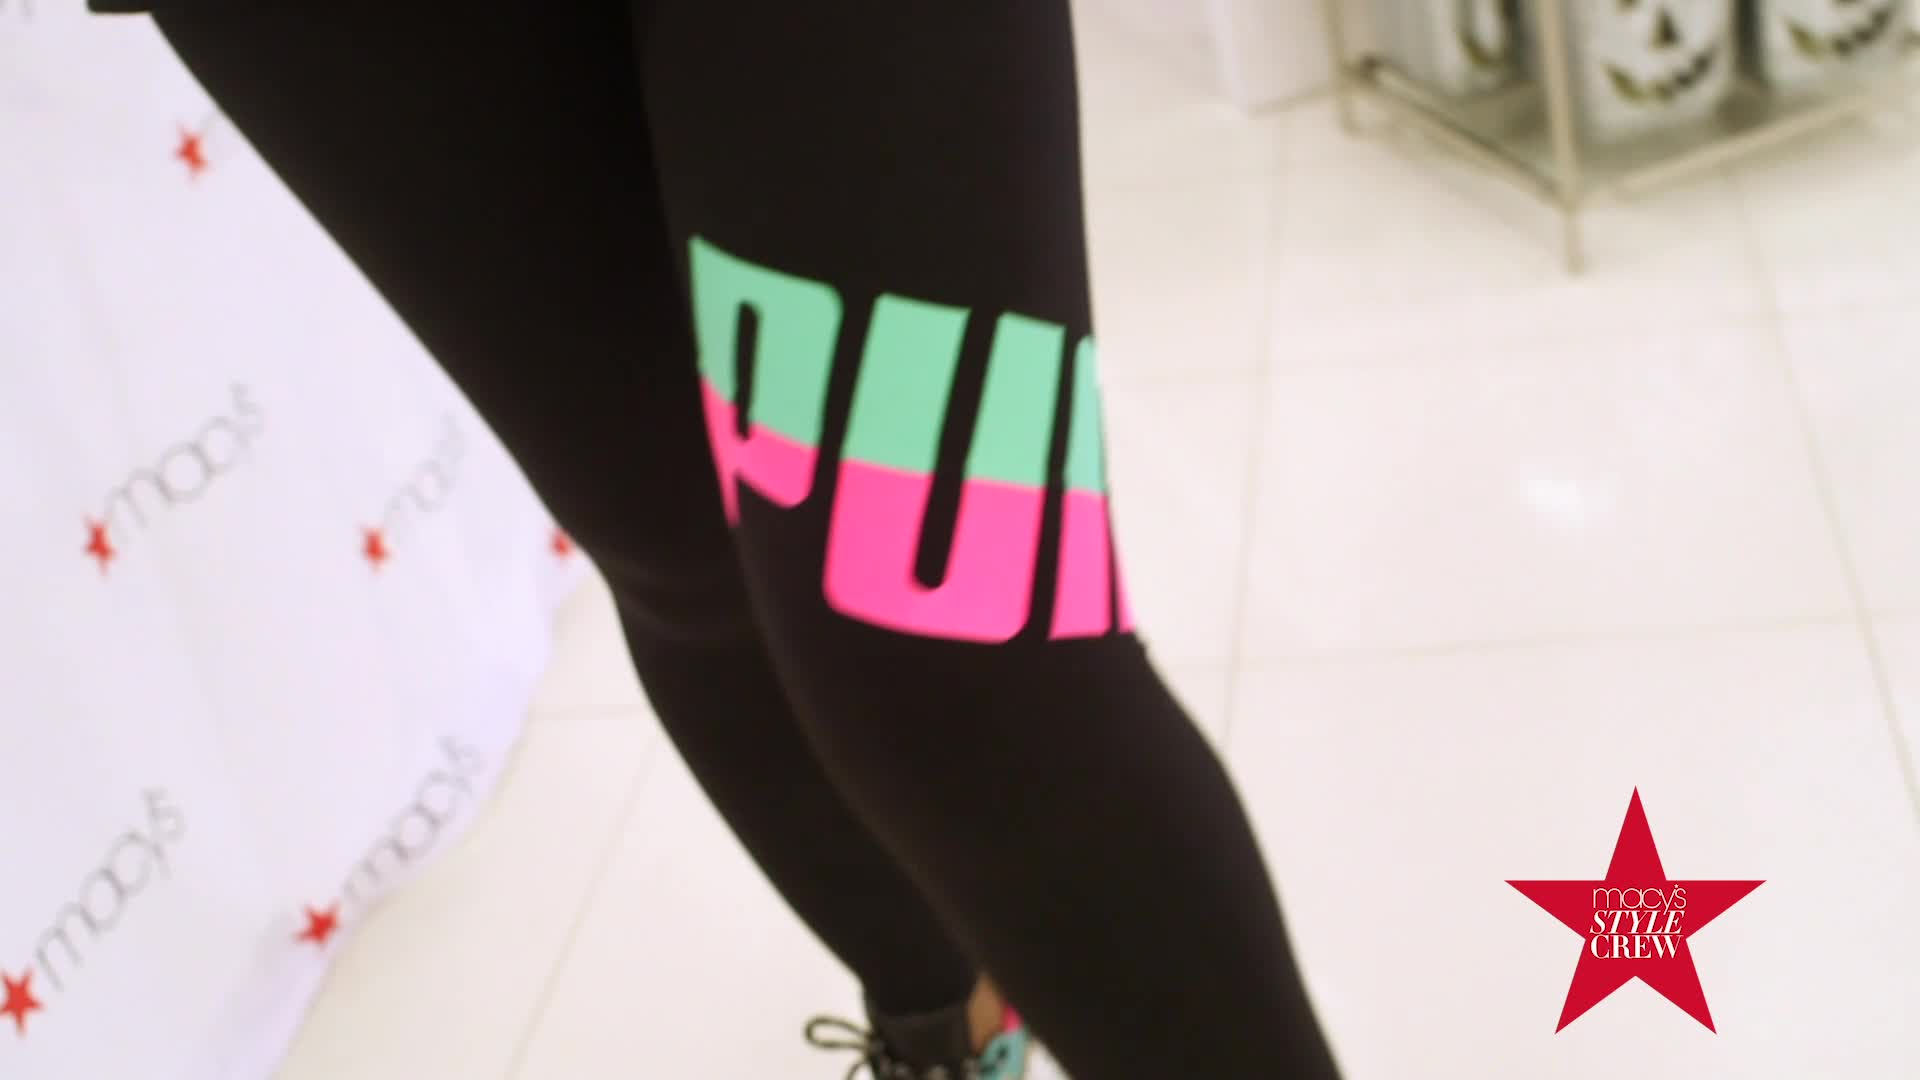 Black Friday Specials Macys Style Cerw Andrea Warner Legging Cotton Rich 4pc Crew